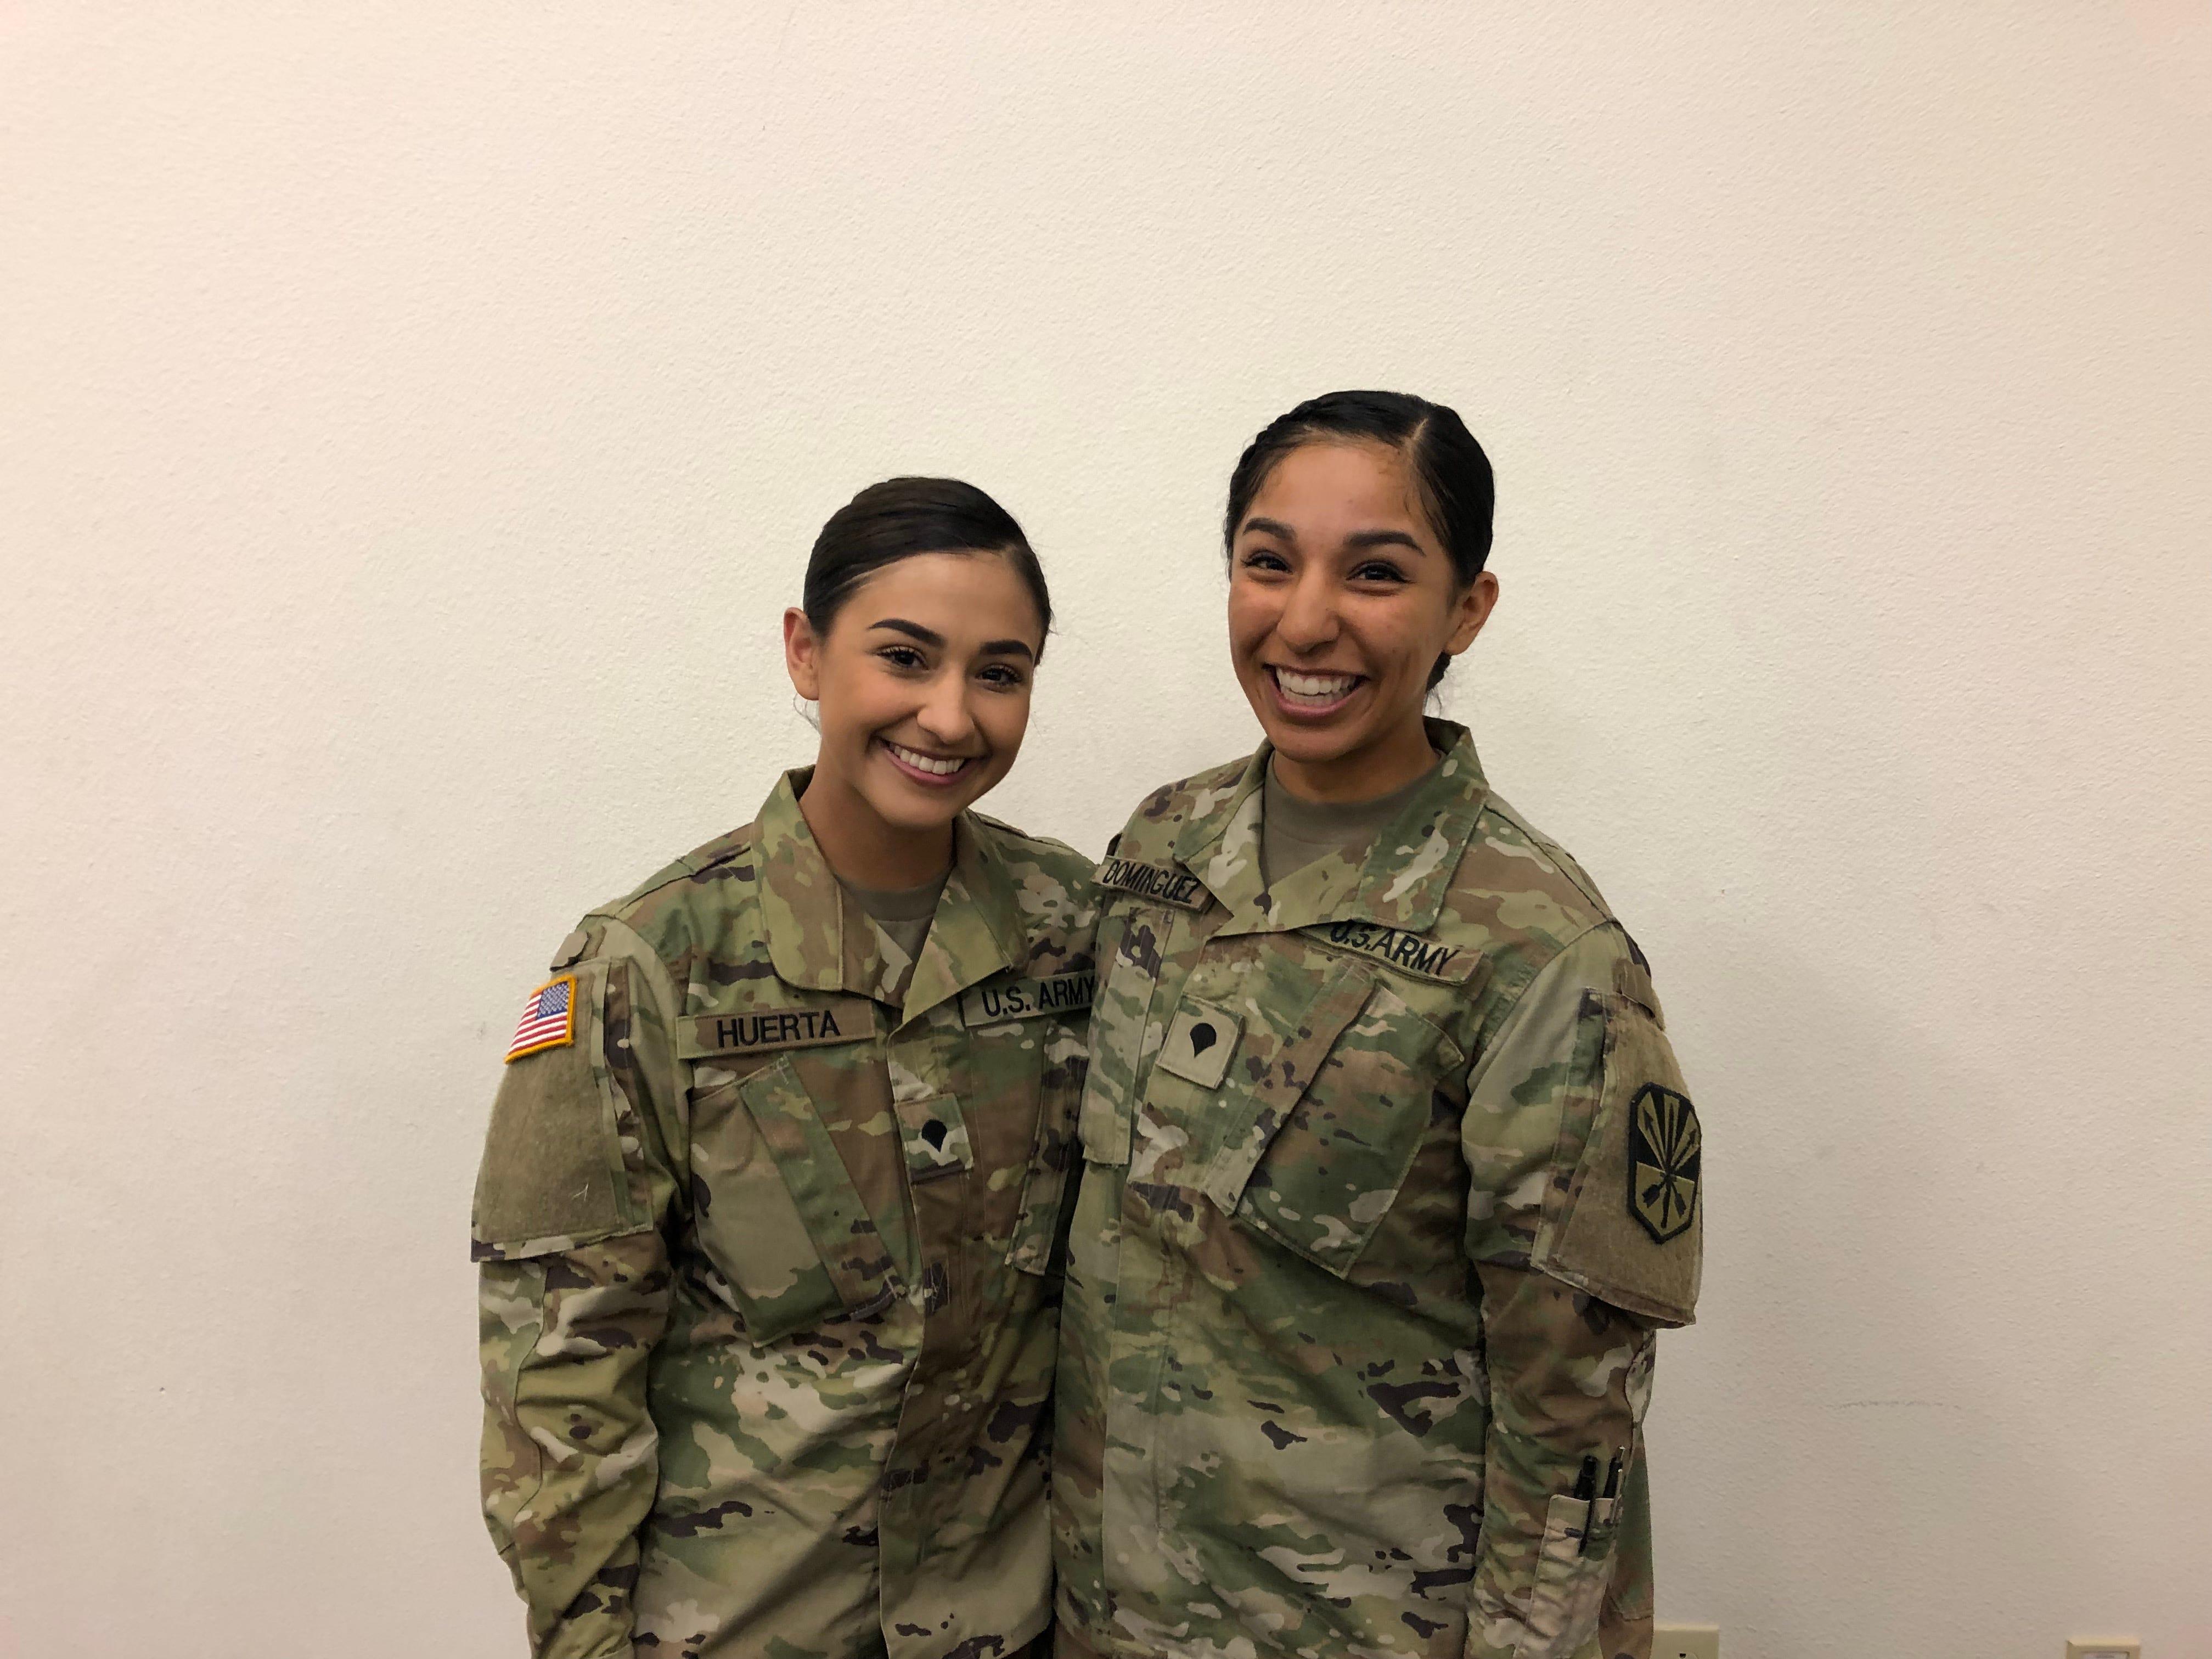 Spc. Kayla Huerta, 21, and Spc. Ana Dominquez, 24.